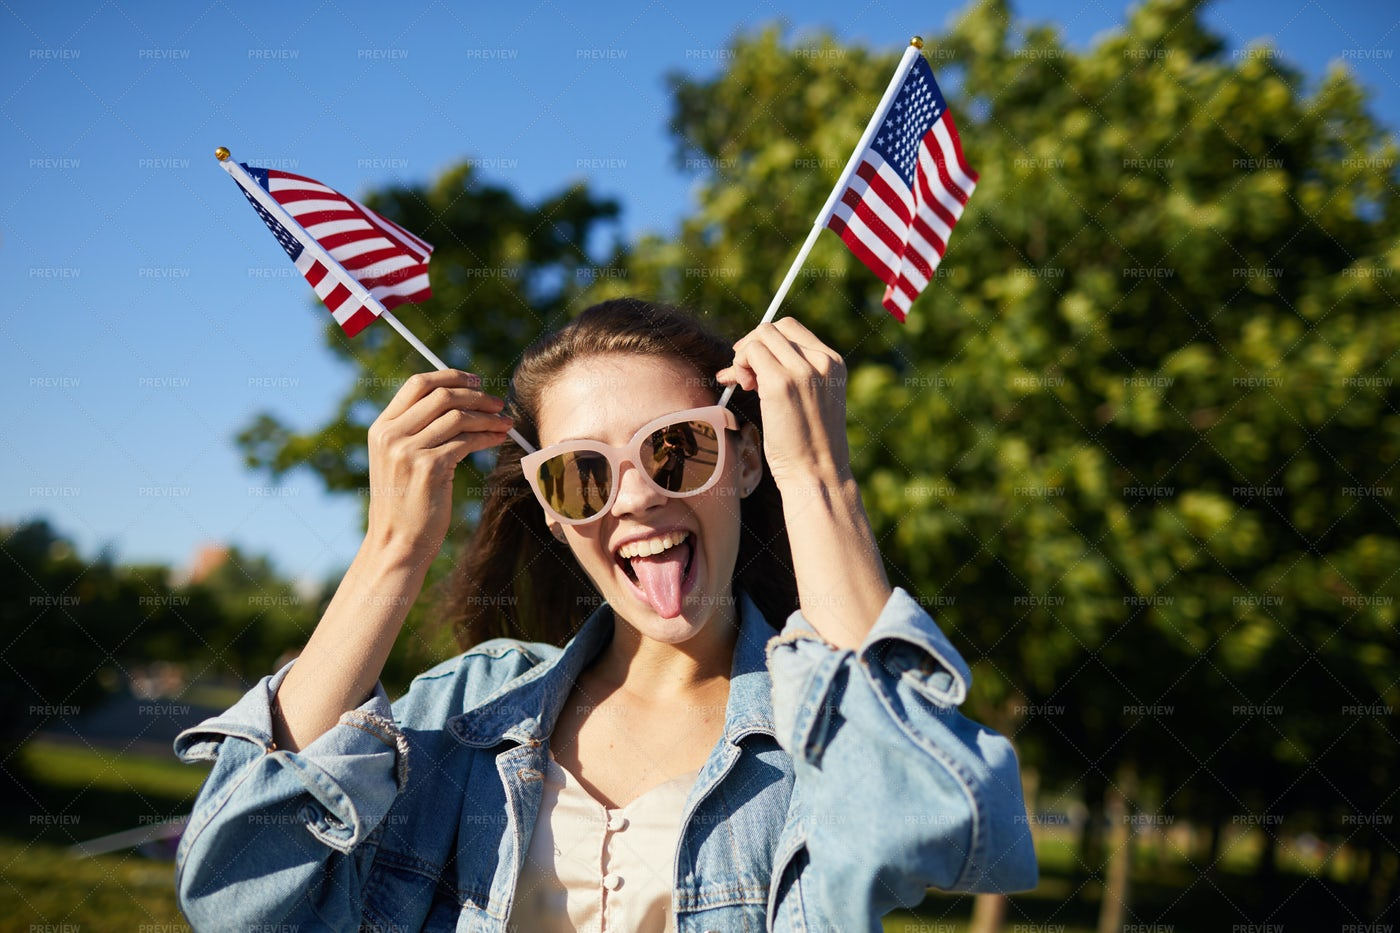 Playful Girl Posing With American...: Stock Photos